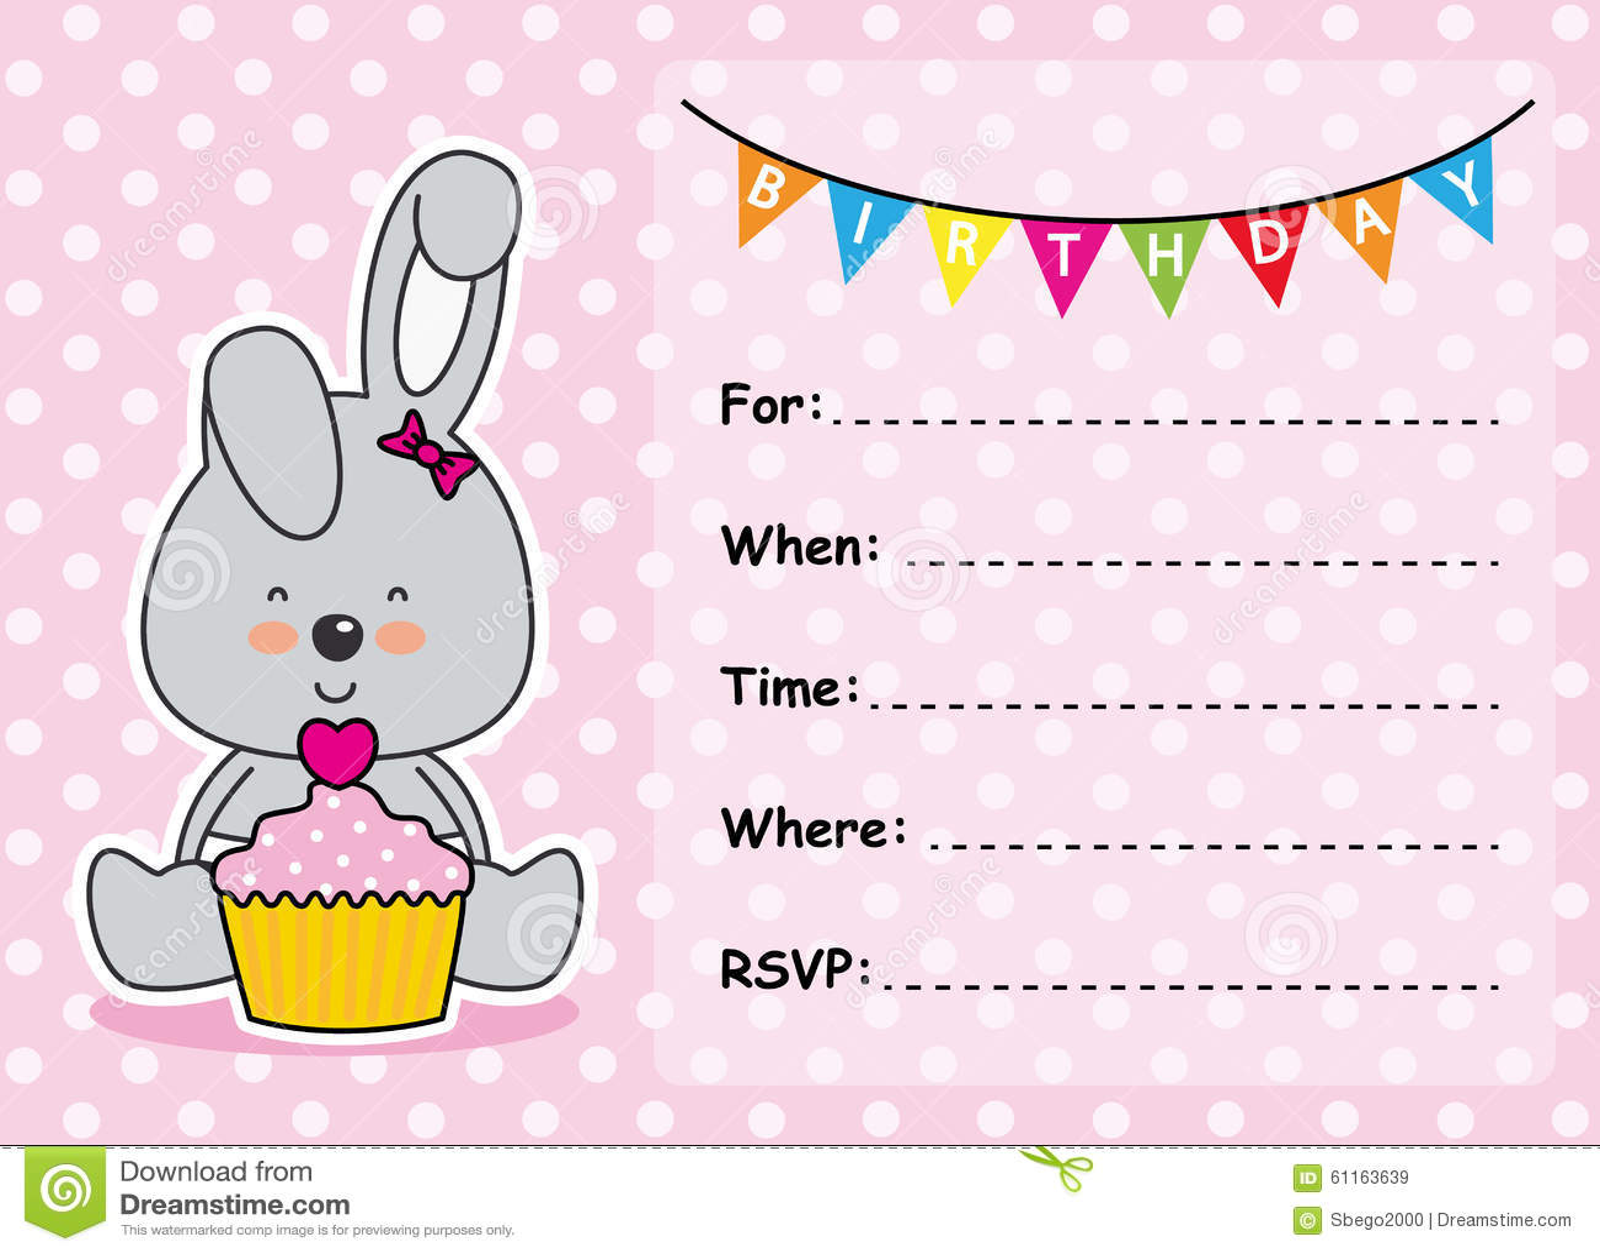 Invitation Card Birthday Girl Stock Vector - Image: 61163639